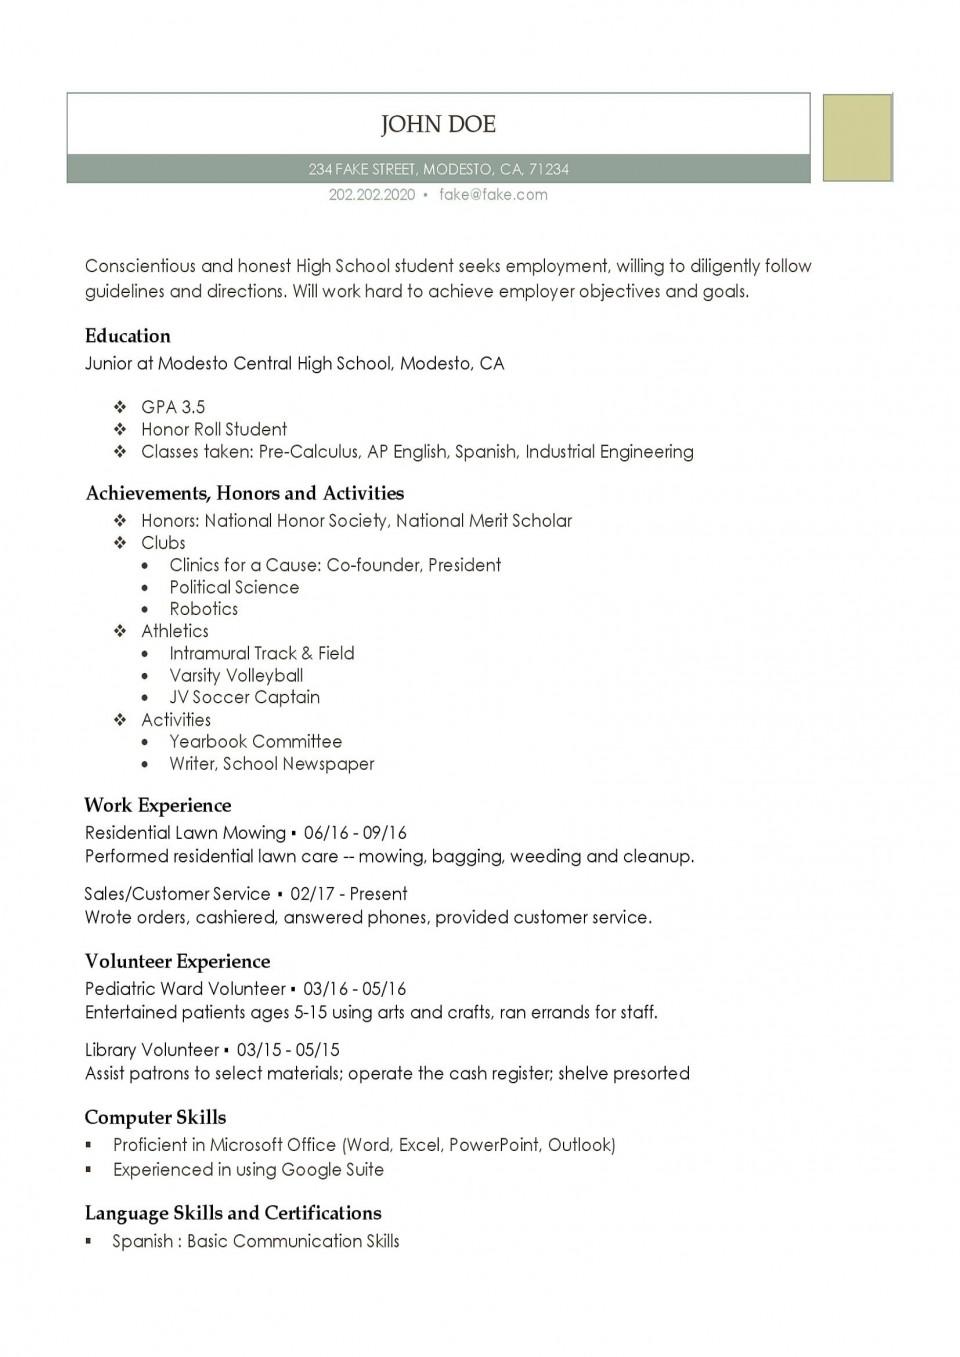 001 Fantastic High School Student Resume Template Resolution  Free Google Doc960